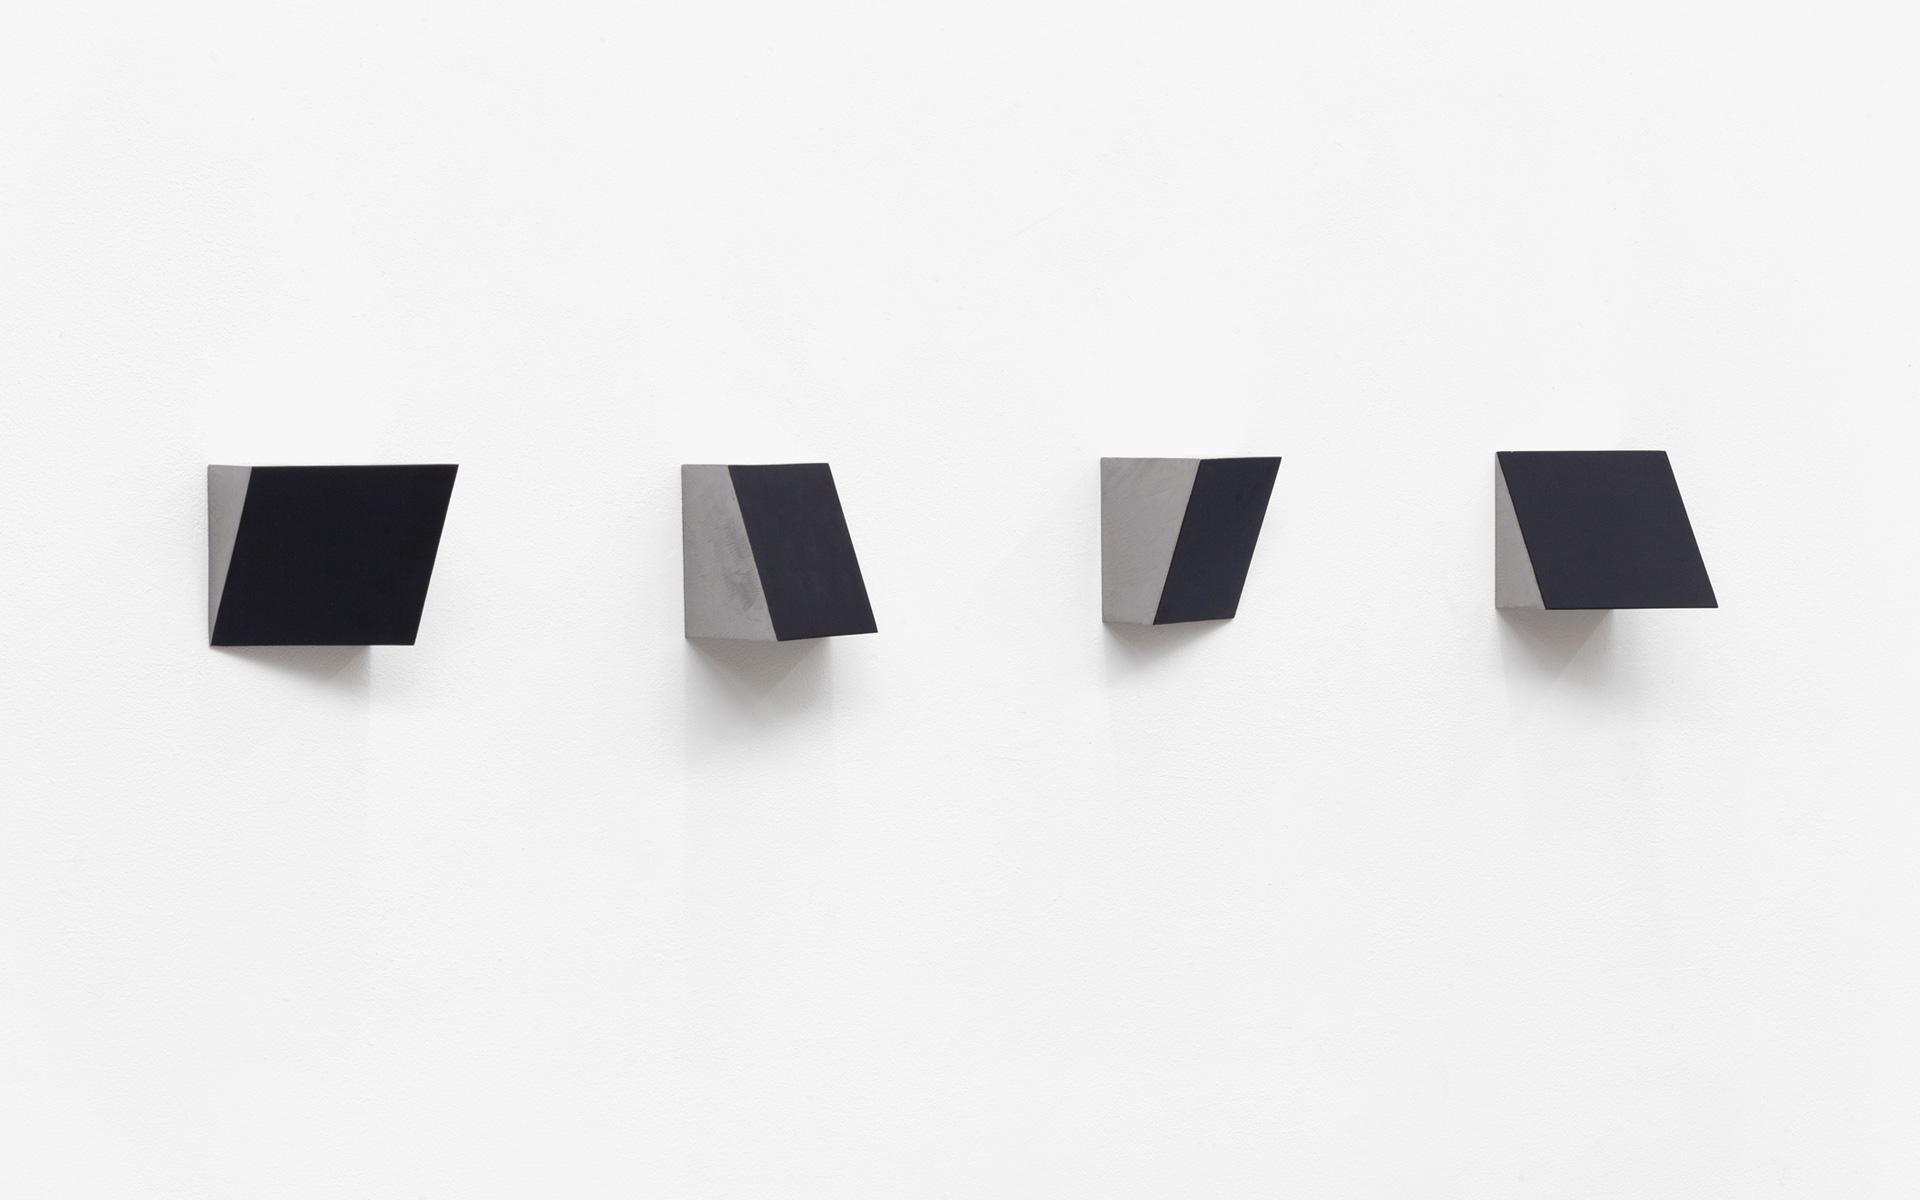 KEILE, four parts, 2002 Acrylic on steel each 10 × 10 × 10 cm - Photo: Christoph Valentien